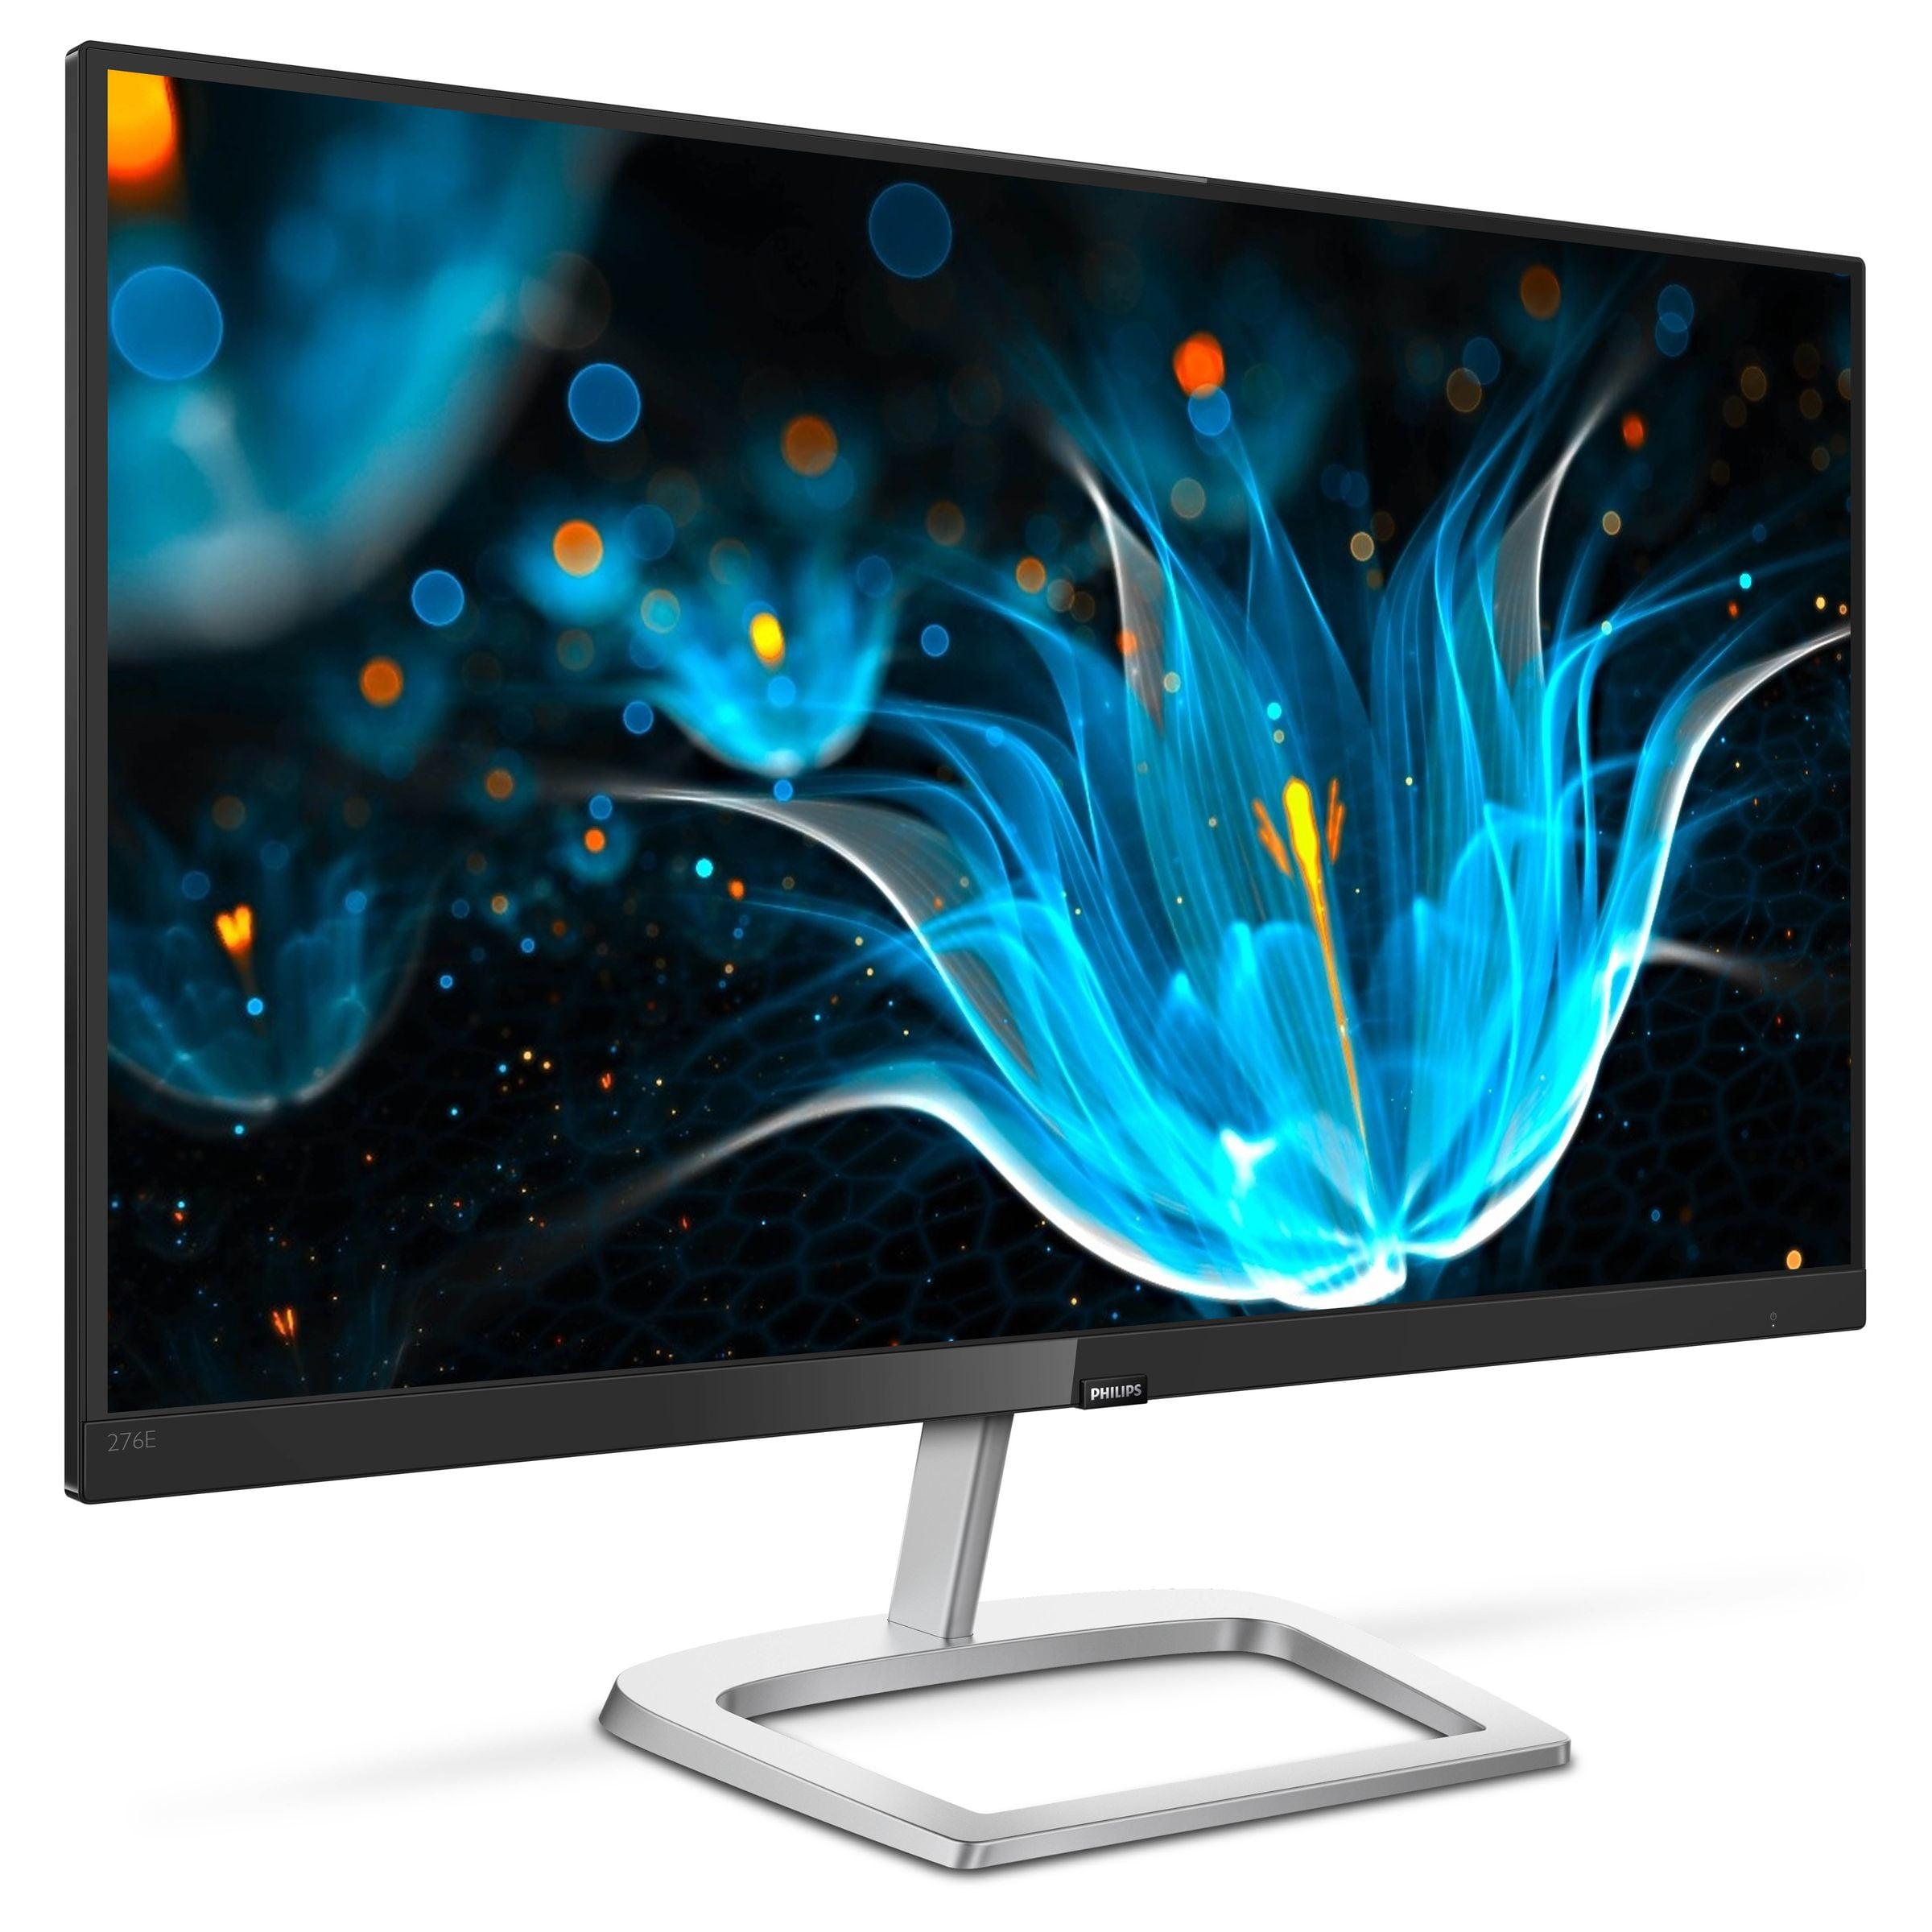 "Philips Monitor 27"" IPS Panel Full HD 1920x1080 75Hz FreeSync Ultra Wide-Color VGA DVI-D HDMI 276E9QDSB"